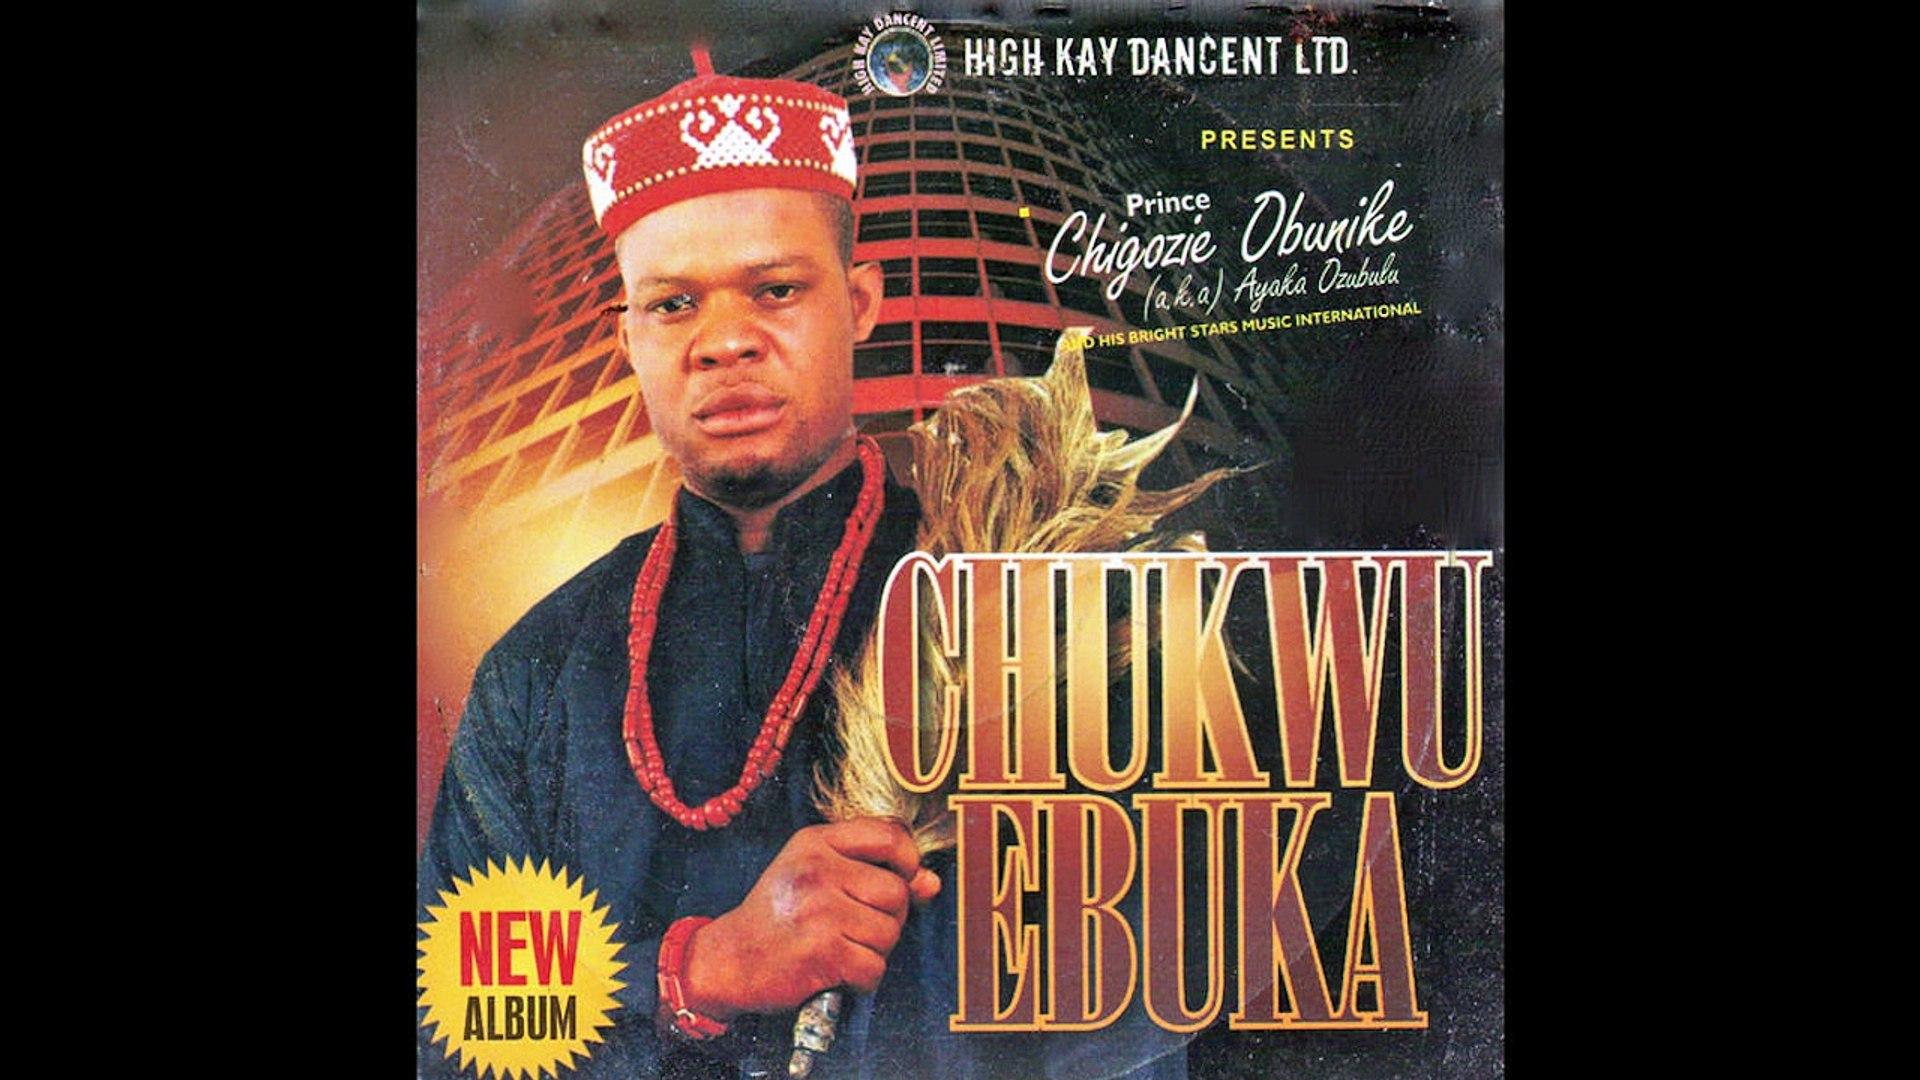 Ayaka Ozubulu - Akwa Nne Nebe [Nigerian Highlife Music 2017]